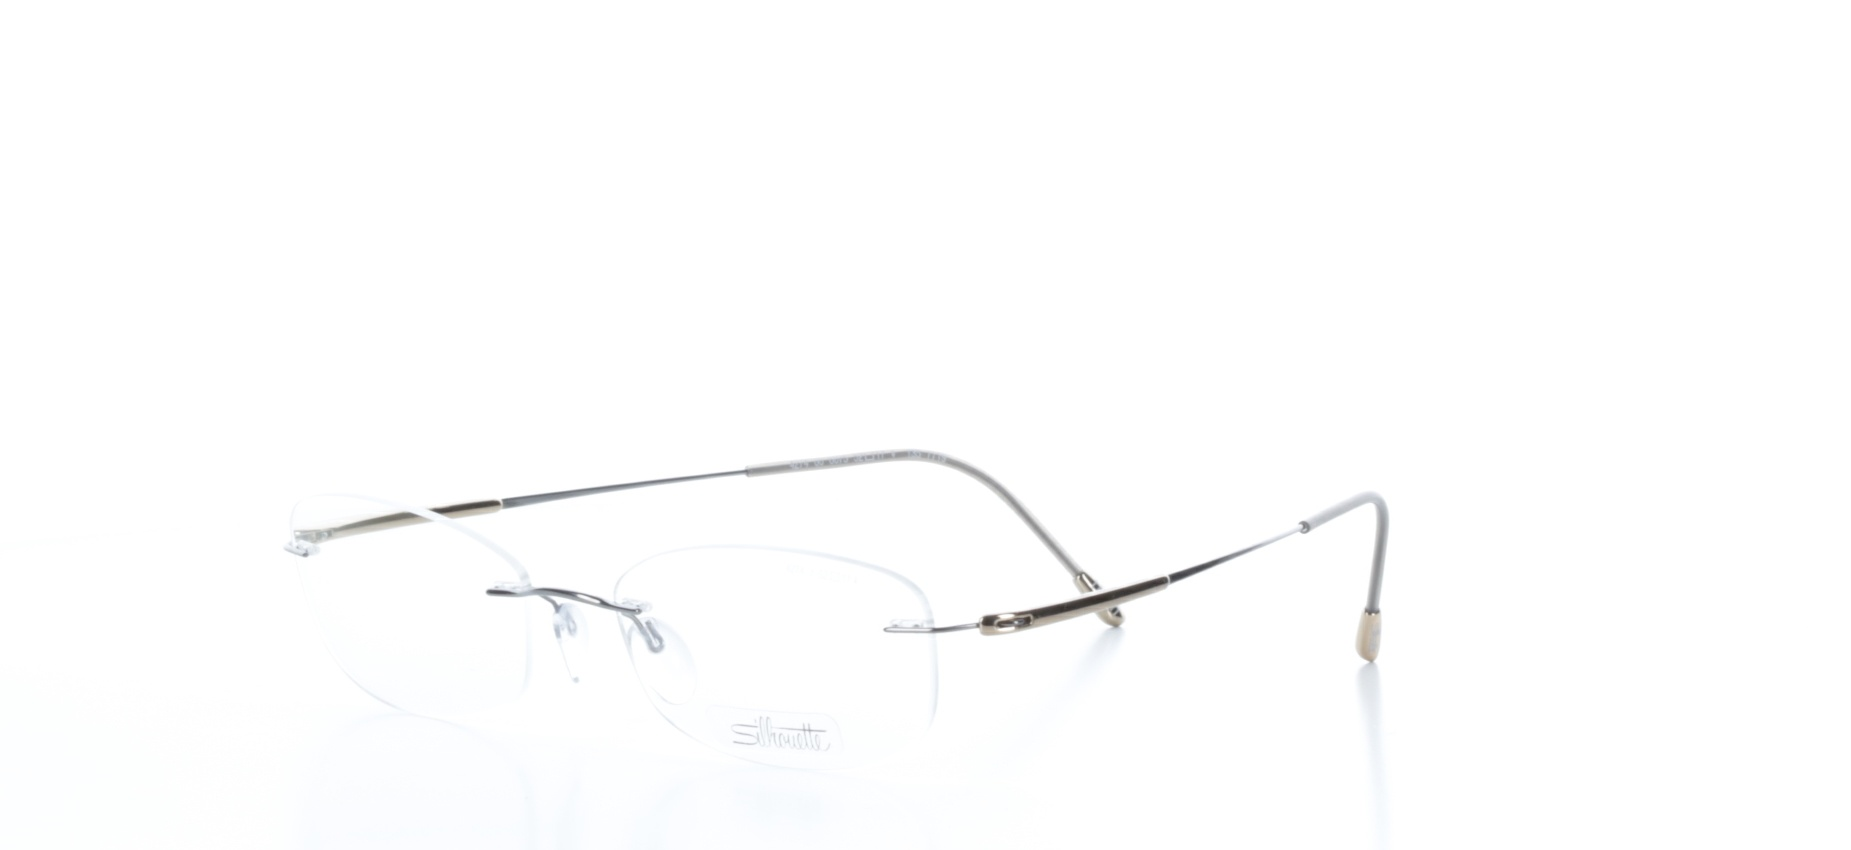 Statele Unite cei mai buni adidași aspect nou Rame-ochelari-dama - Rama-ochelari-vedere-Silhouette-4274